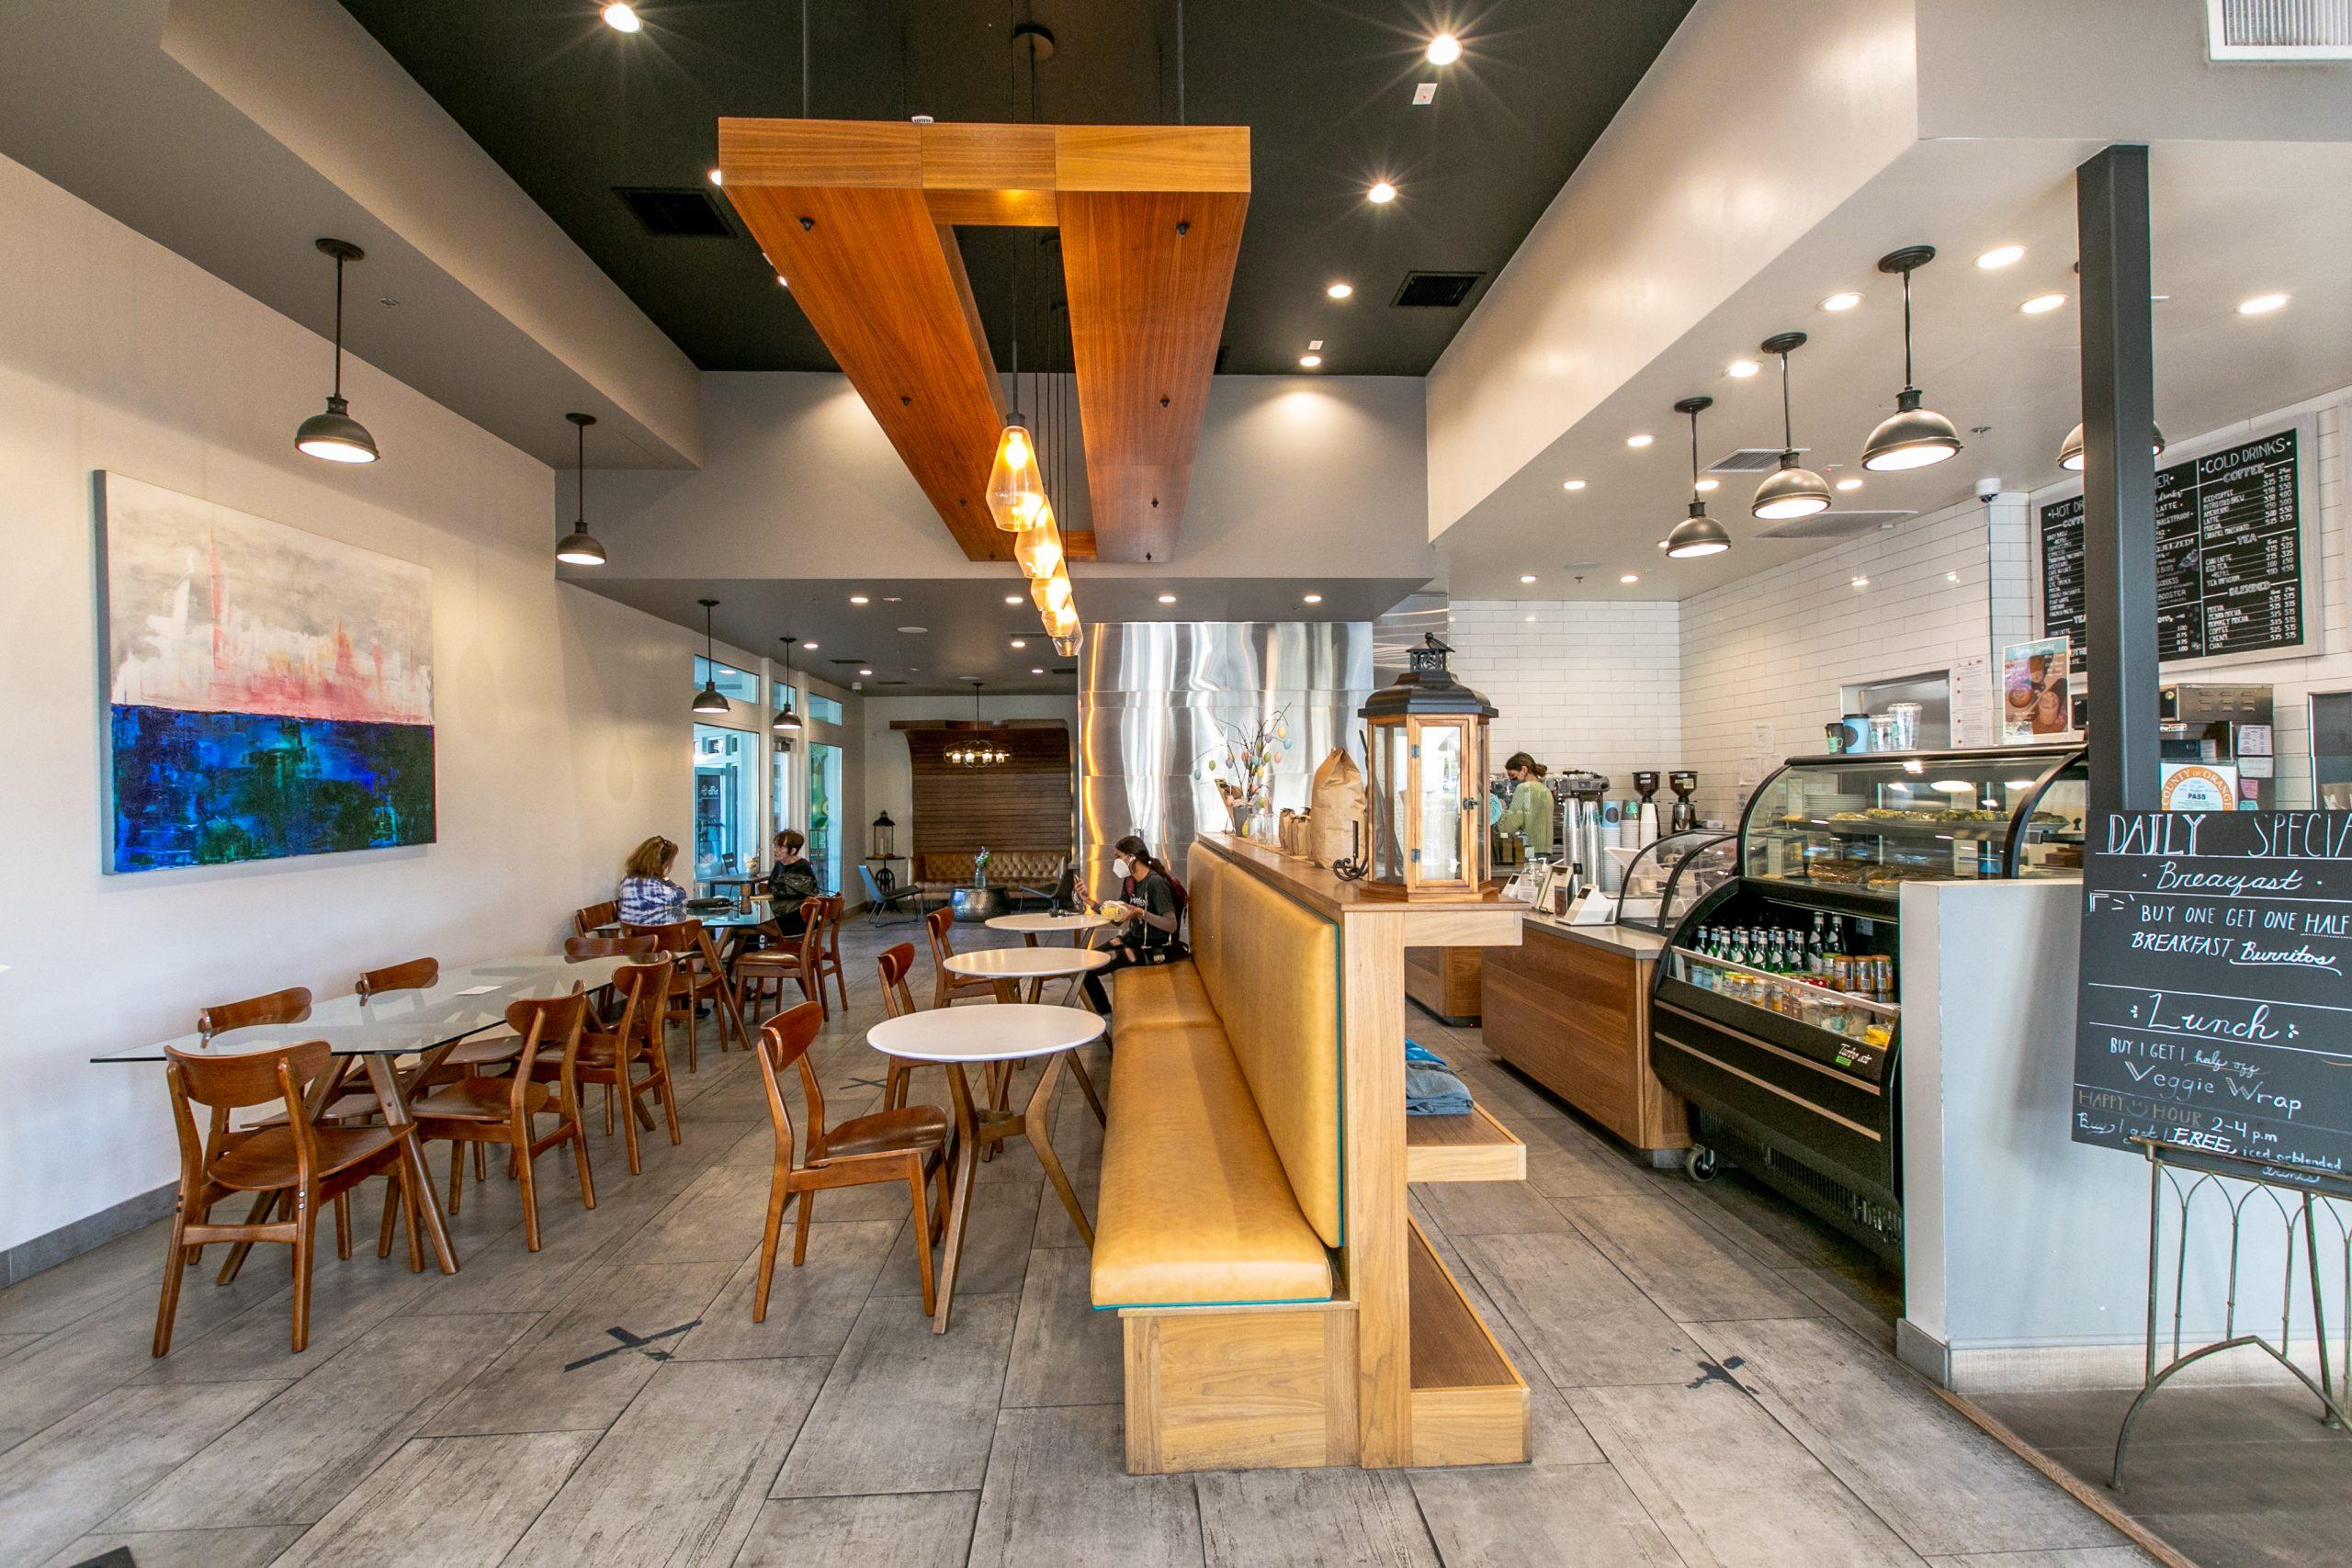 Lost Bean Restaurant Architecture and Interior Design